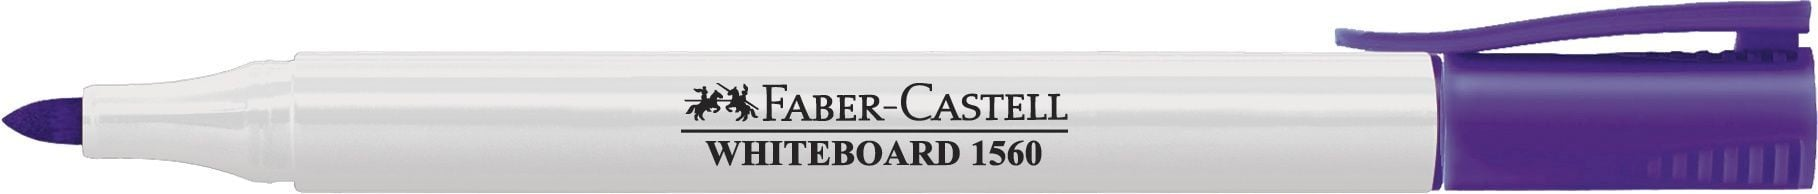 MARKER WHITEBOARD VIOLET SLIM 1560 FABER-CASTELL